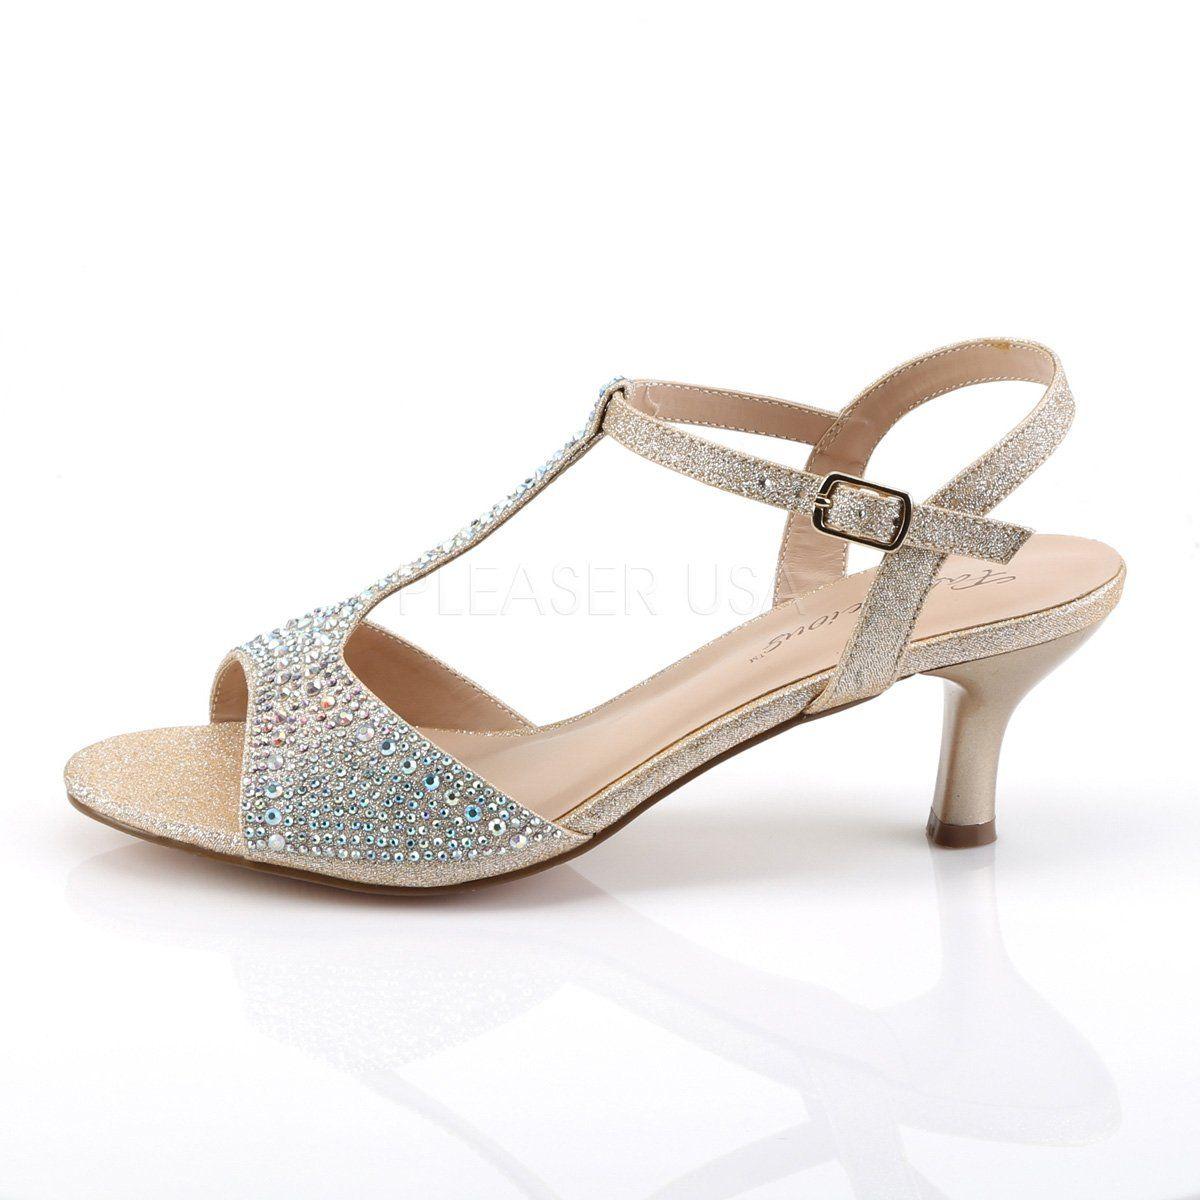 2 1 2 Inch Kitten Heel T Strap Sandal Shimmer 2 1 2 Inch 6 4cm Kitten Heel T Strap Sandal Embellished With Slv Multi Graduation Shoes Heels T Strap Sandals